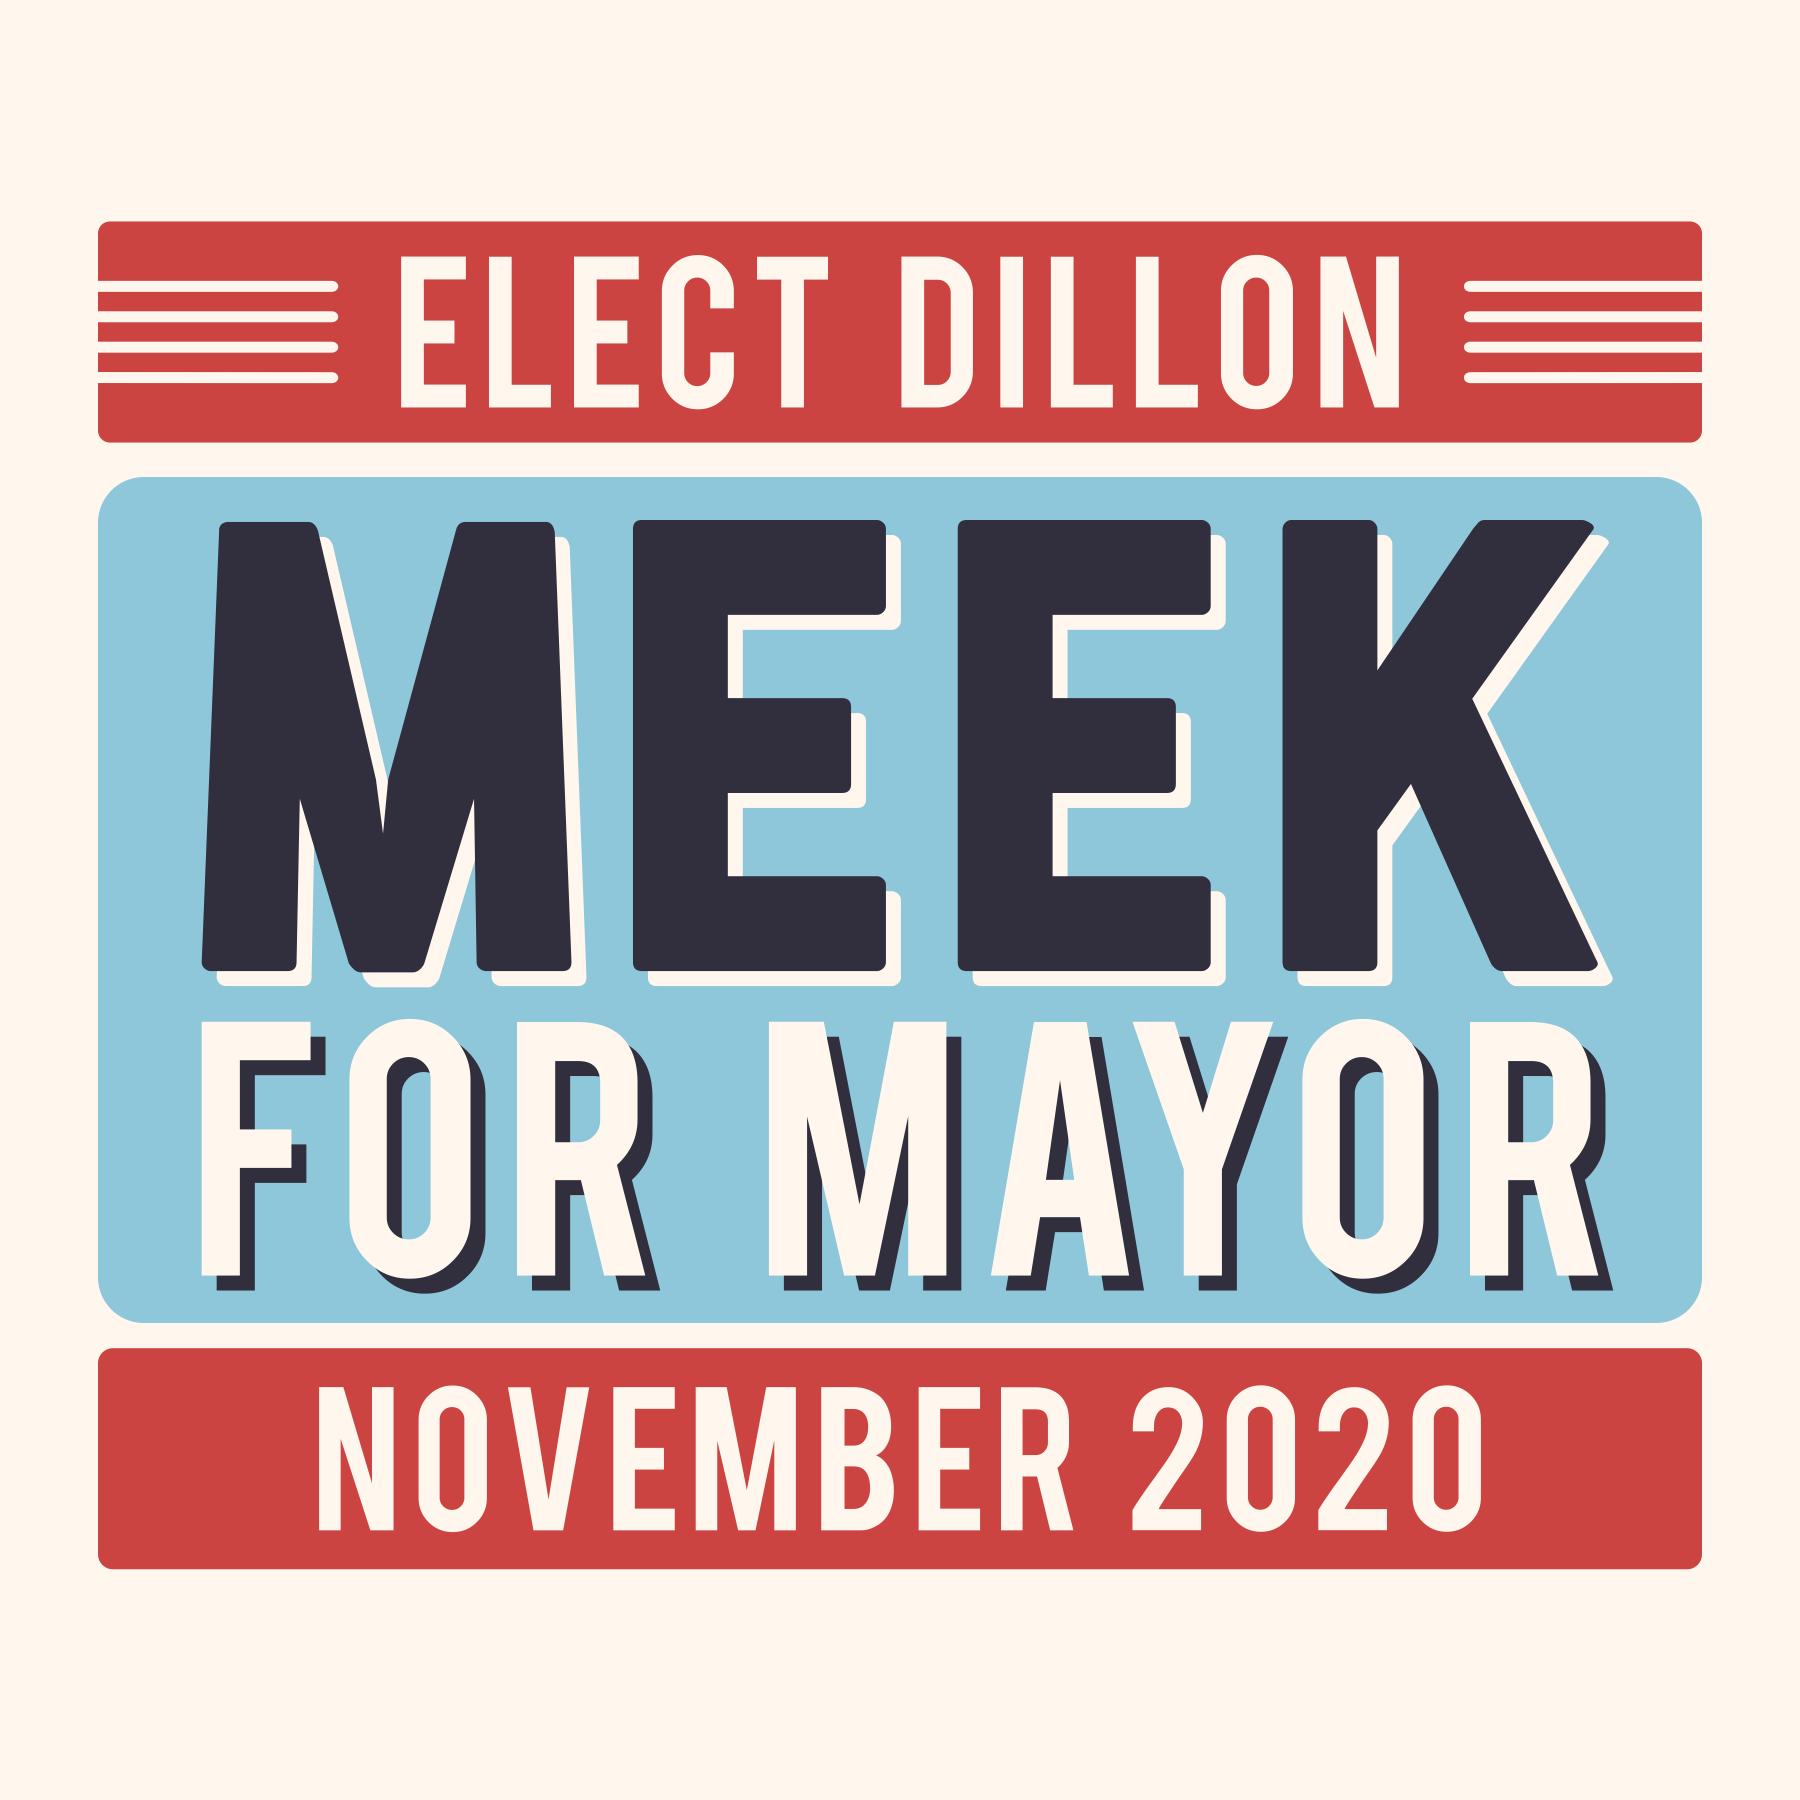 Elect Dillon Meek For Waco's Mayor May 2020 Campaign Logo